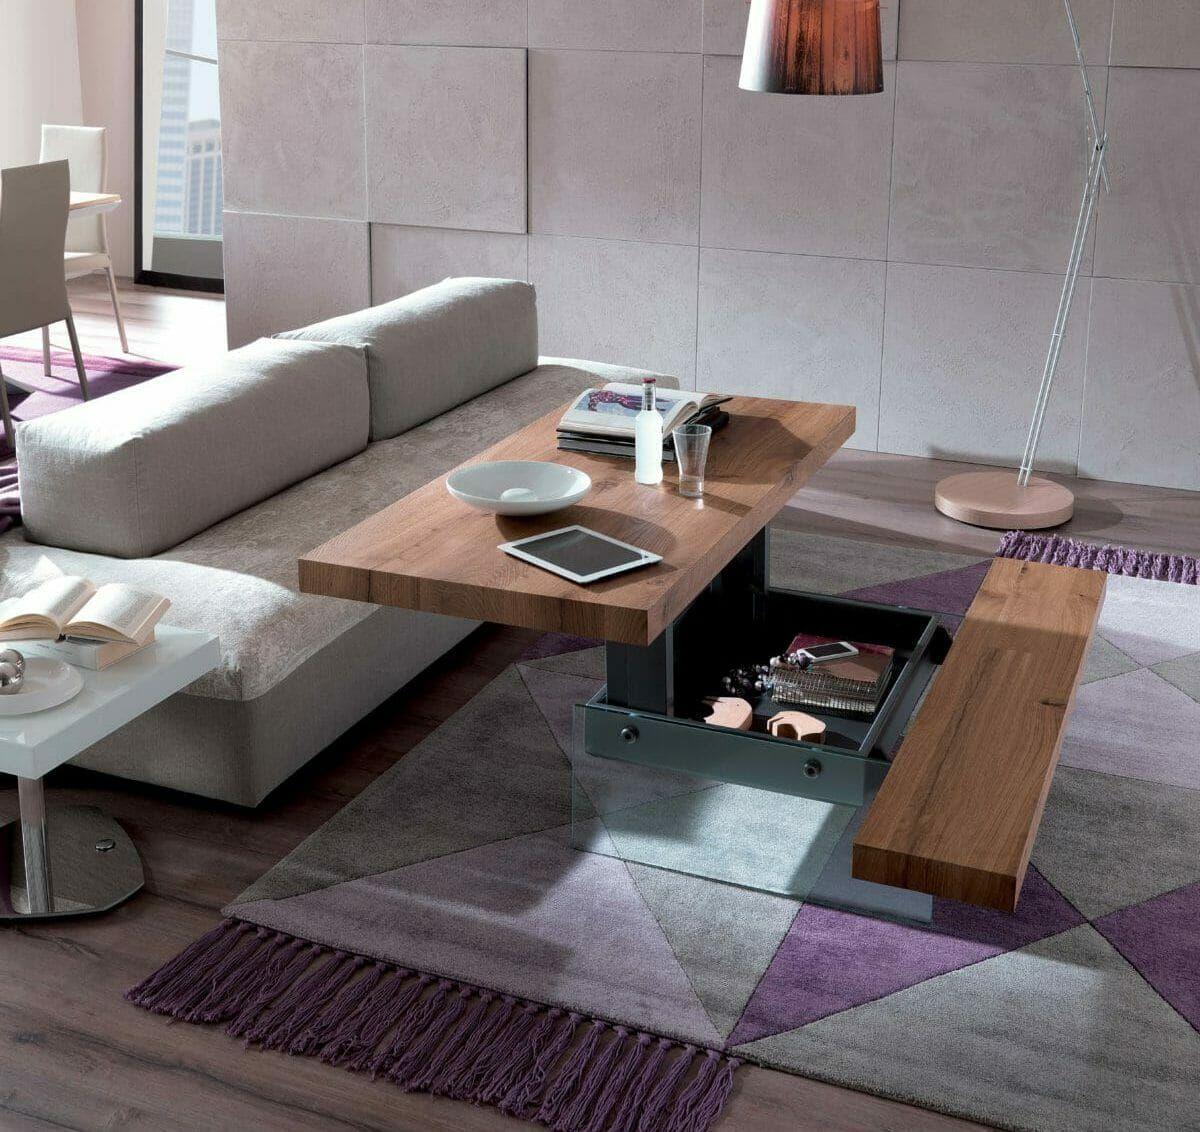 Tesoro Picnic Resource Furniture Small Apartment Furniture